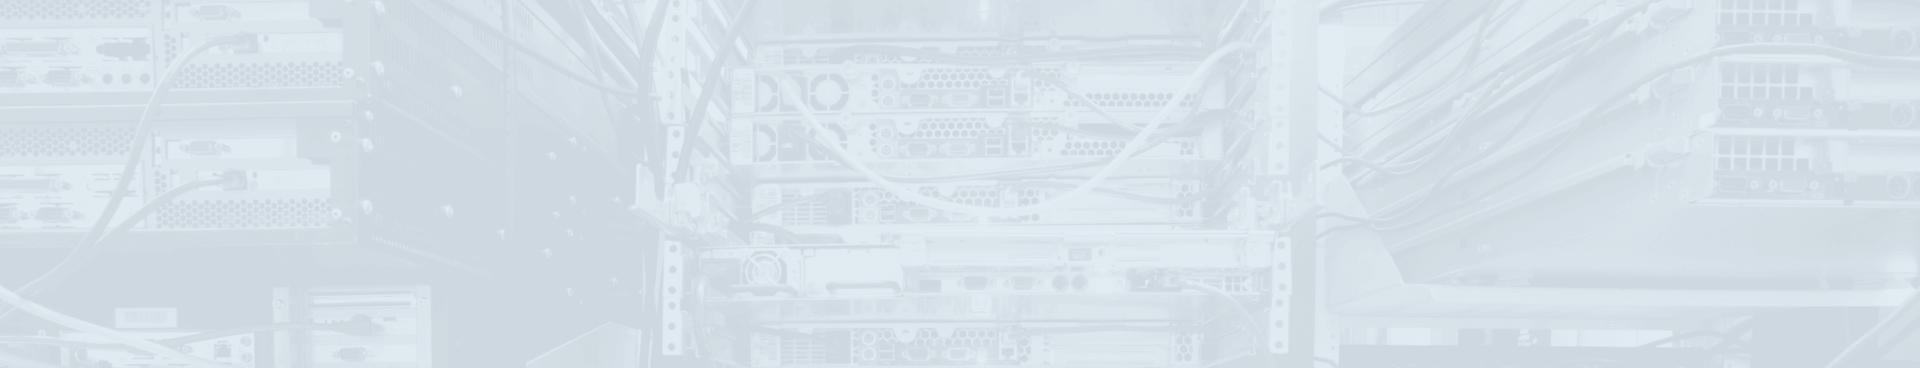 Cyber Security From A FireEye Platinum Partner   DynTek